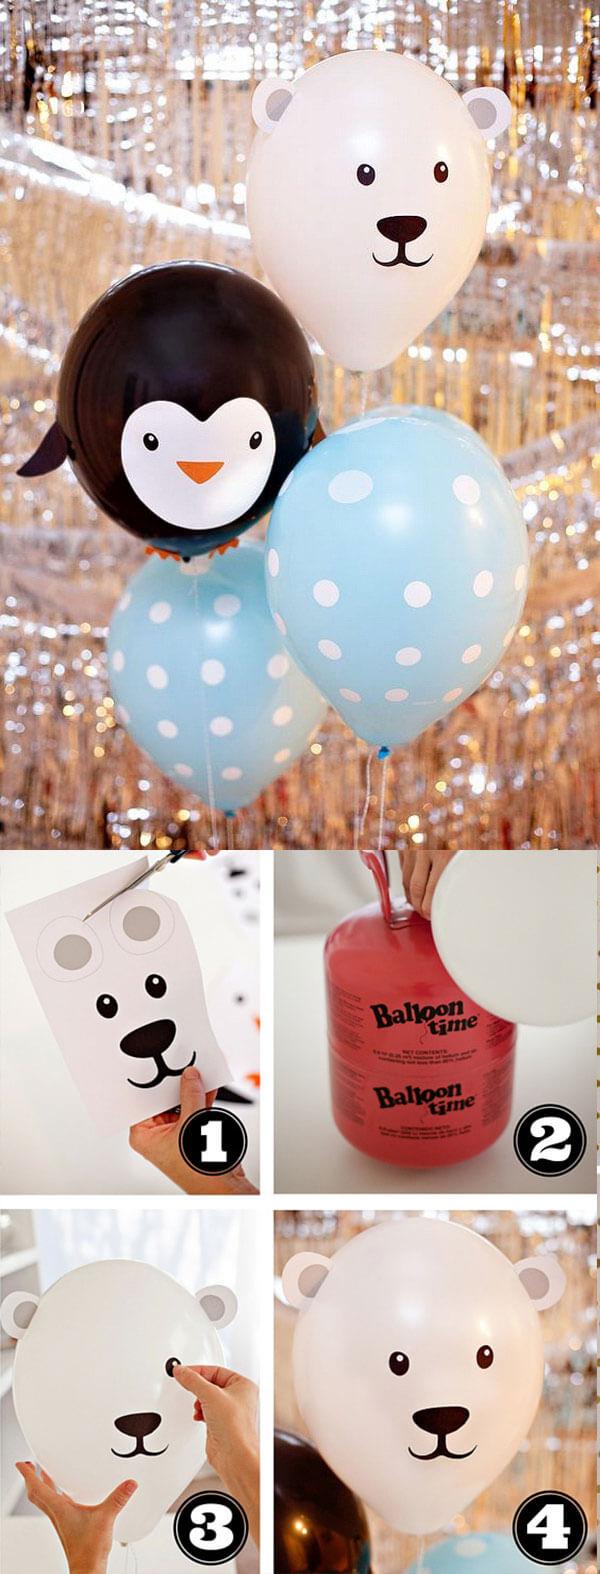 33 balloon decoration ideas - بادکنک آرایی کودکانه جذاب